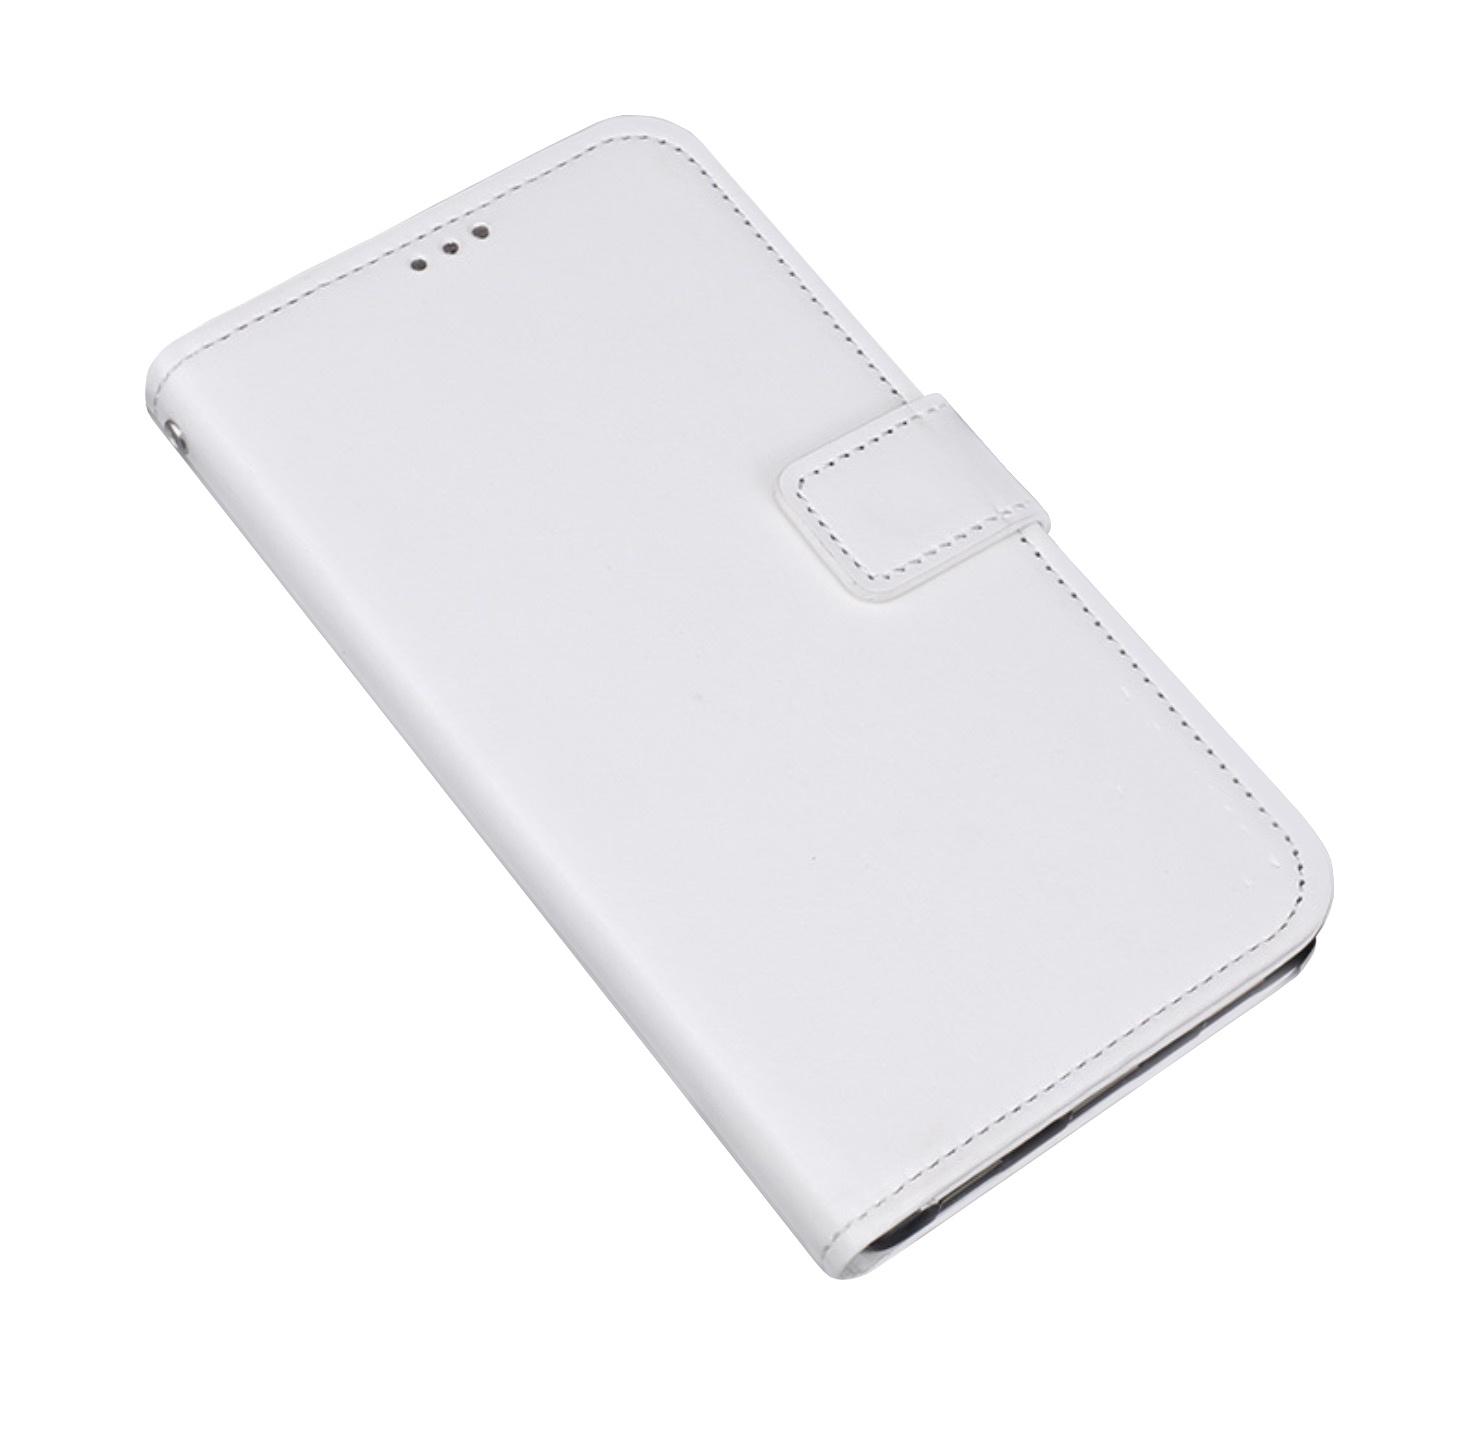 Чехол-книжка MyPads для Alcatel One Touch Idol 3 4.7 Dual Sim 6039Y/K с мульти-подставкой застёжкой и визитницей белый